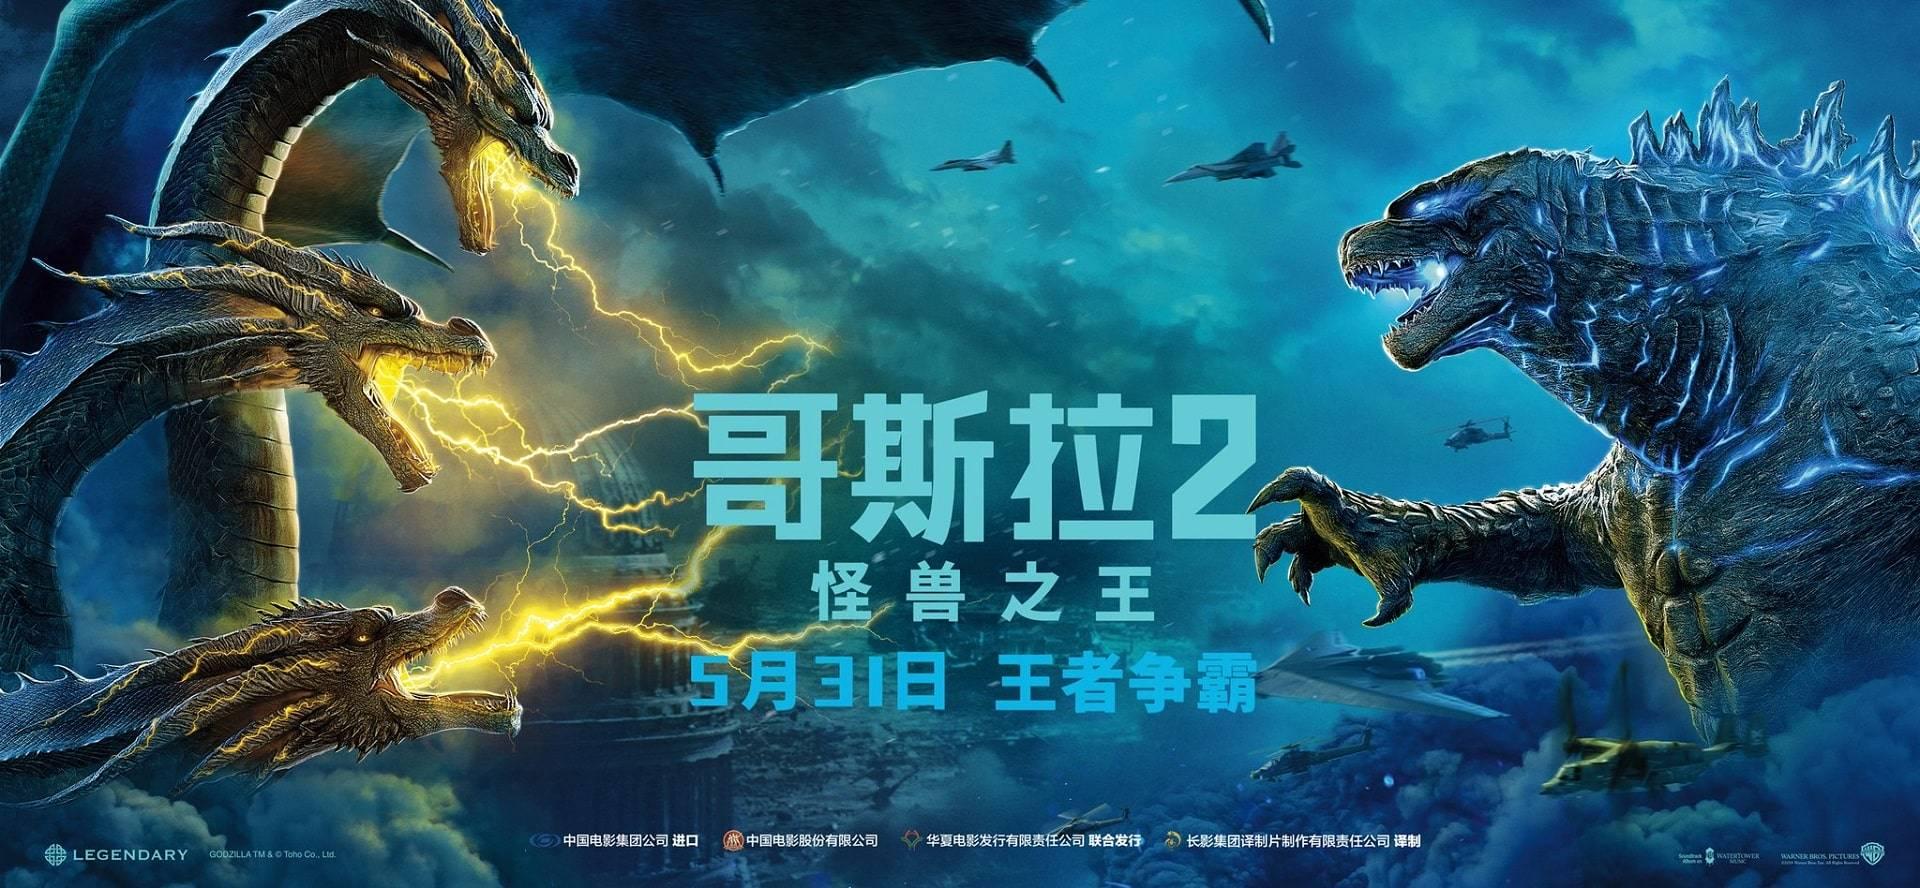 Godzilla II: King of the monsters, ecco il full trailer!